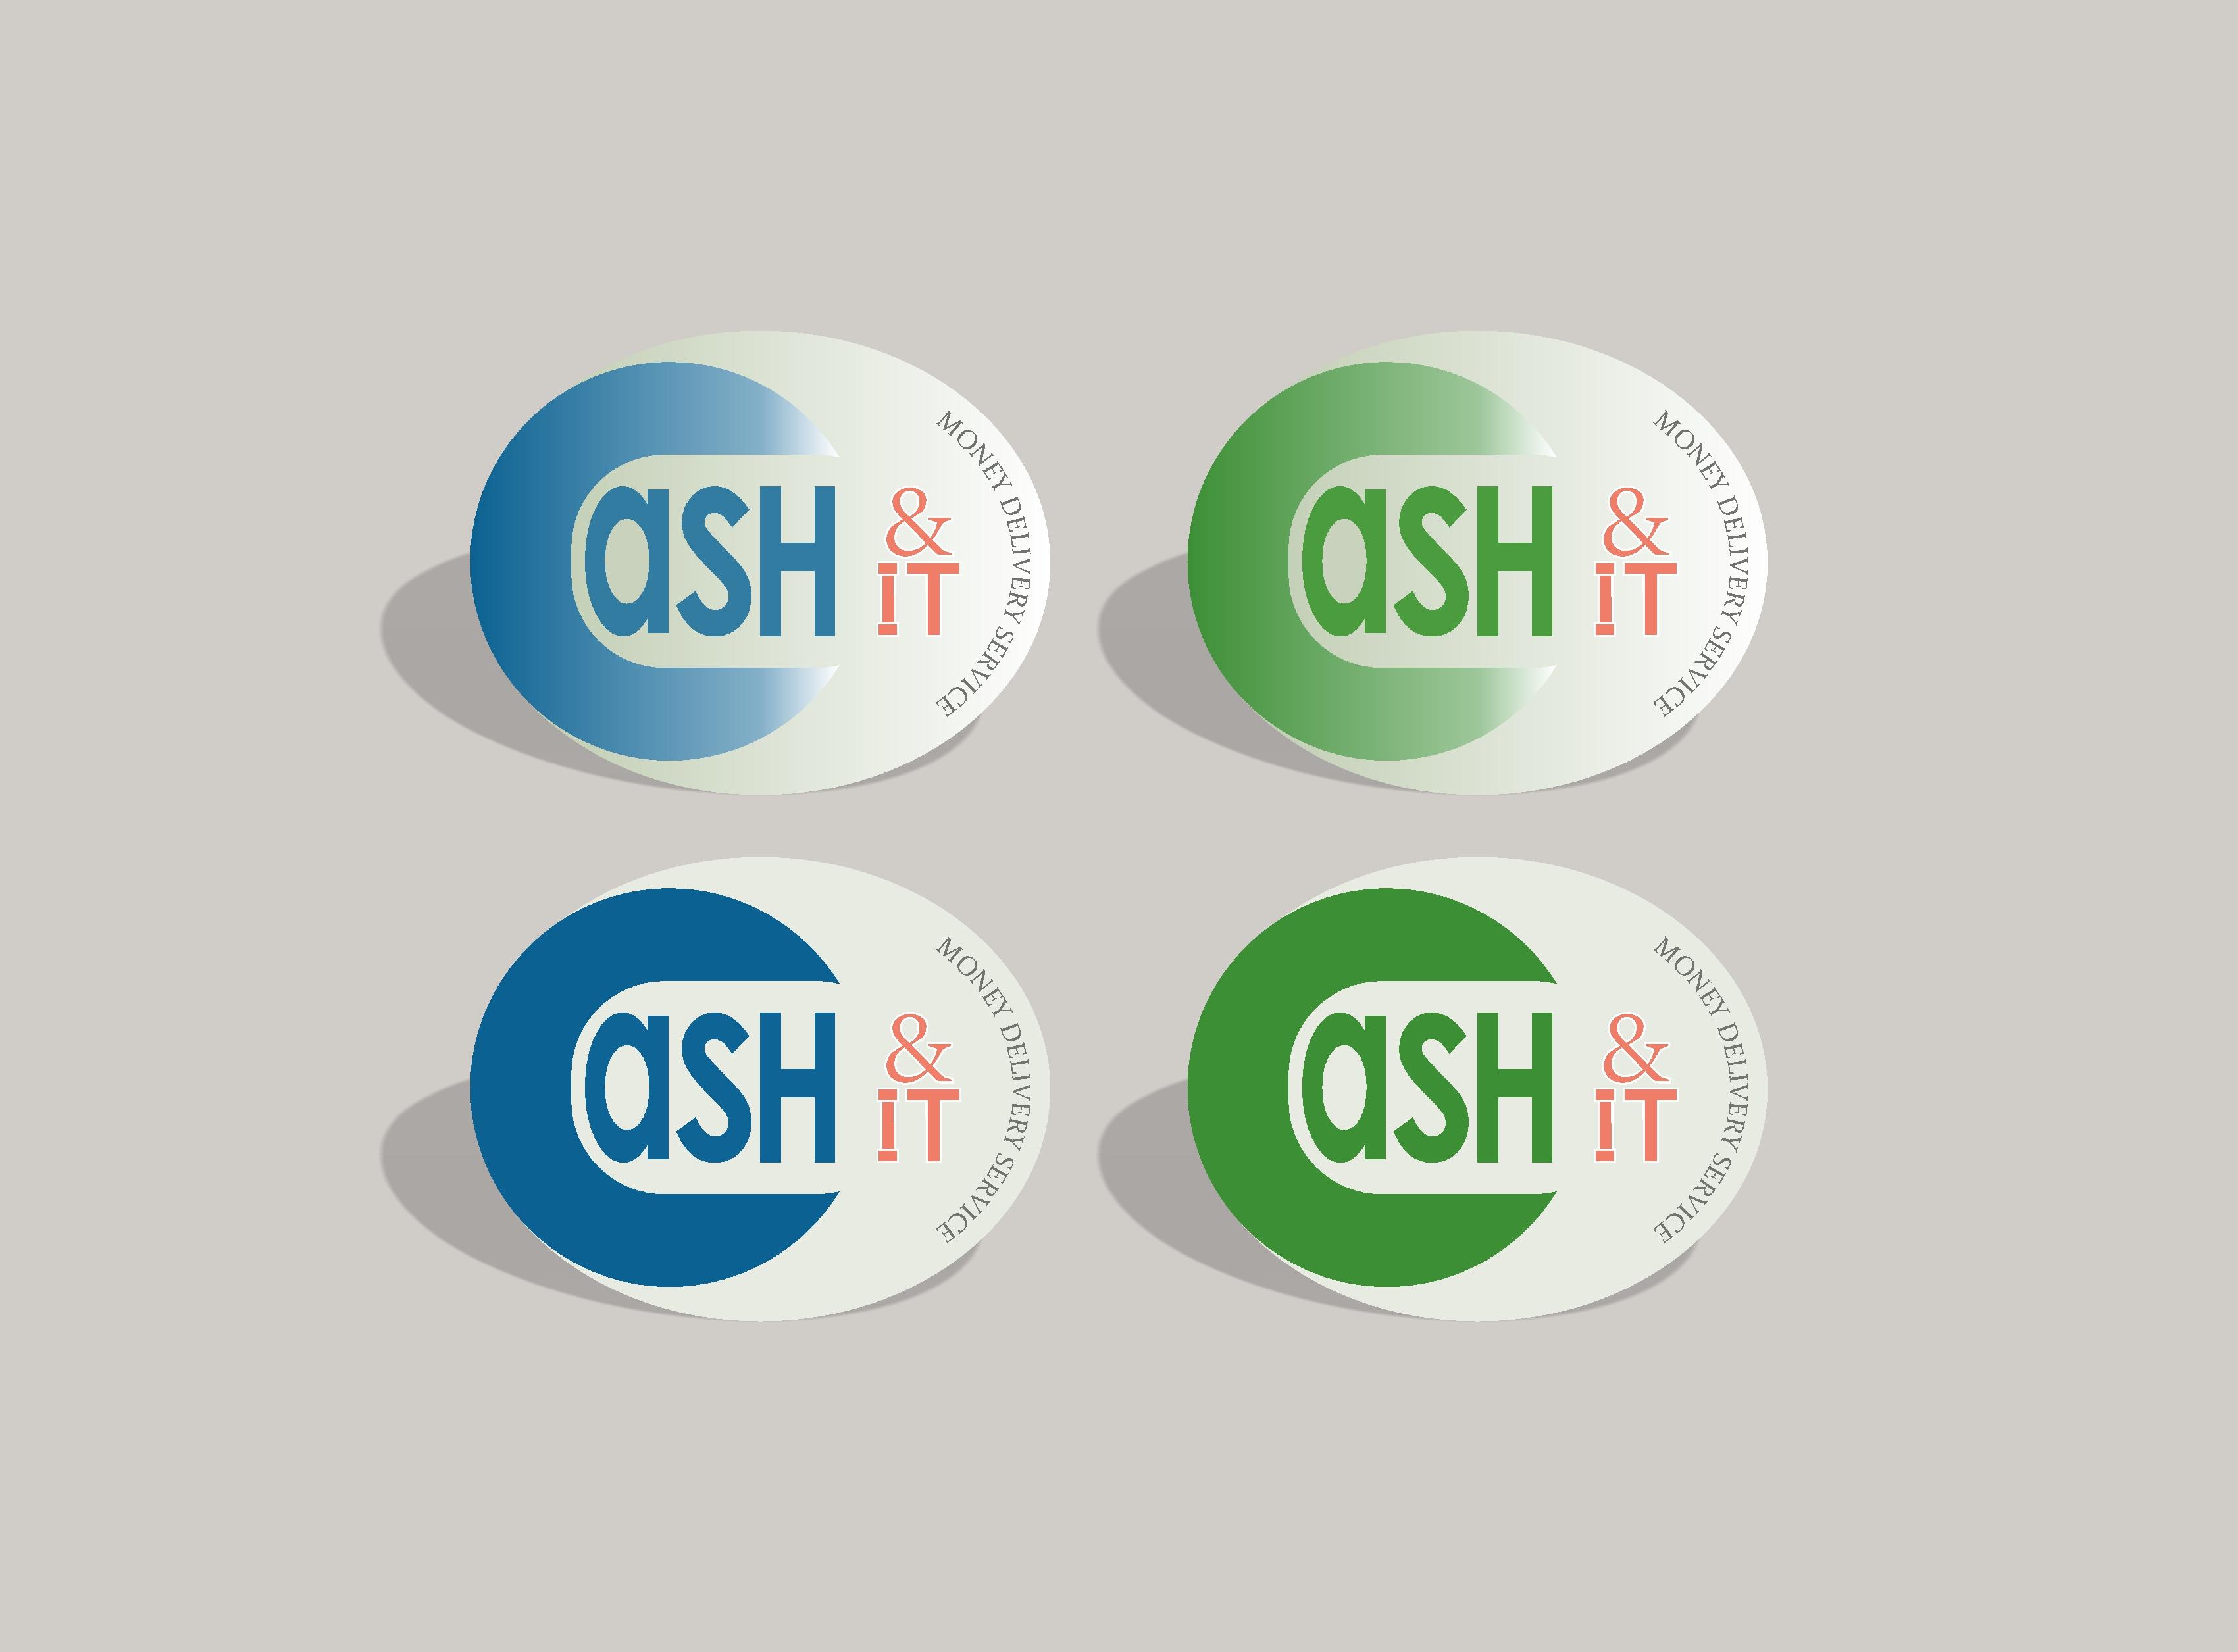 Логотип для Cash & IT - сервис доставки денег фото f_9425fe18f129c4e6.jpg